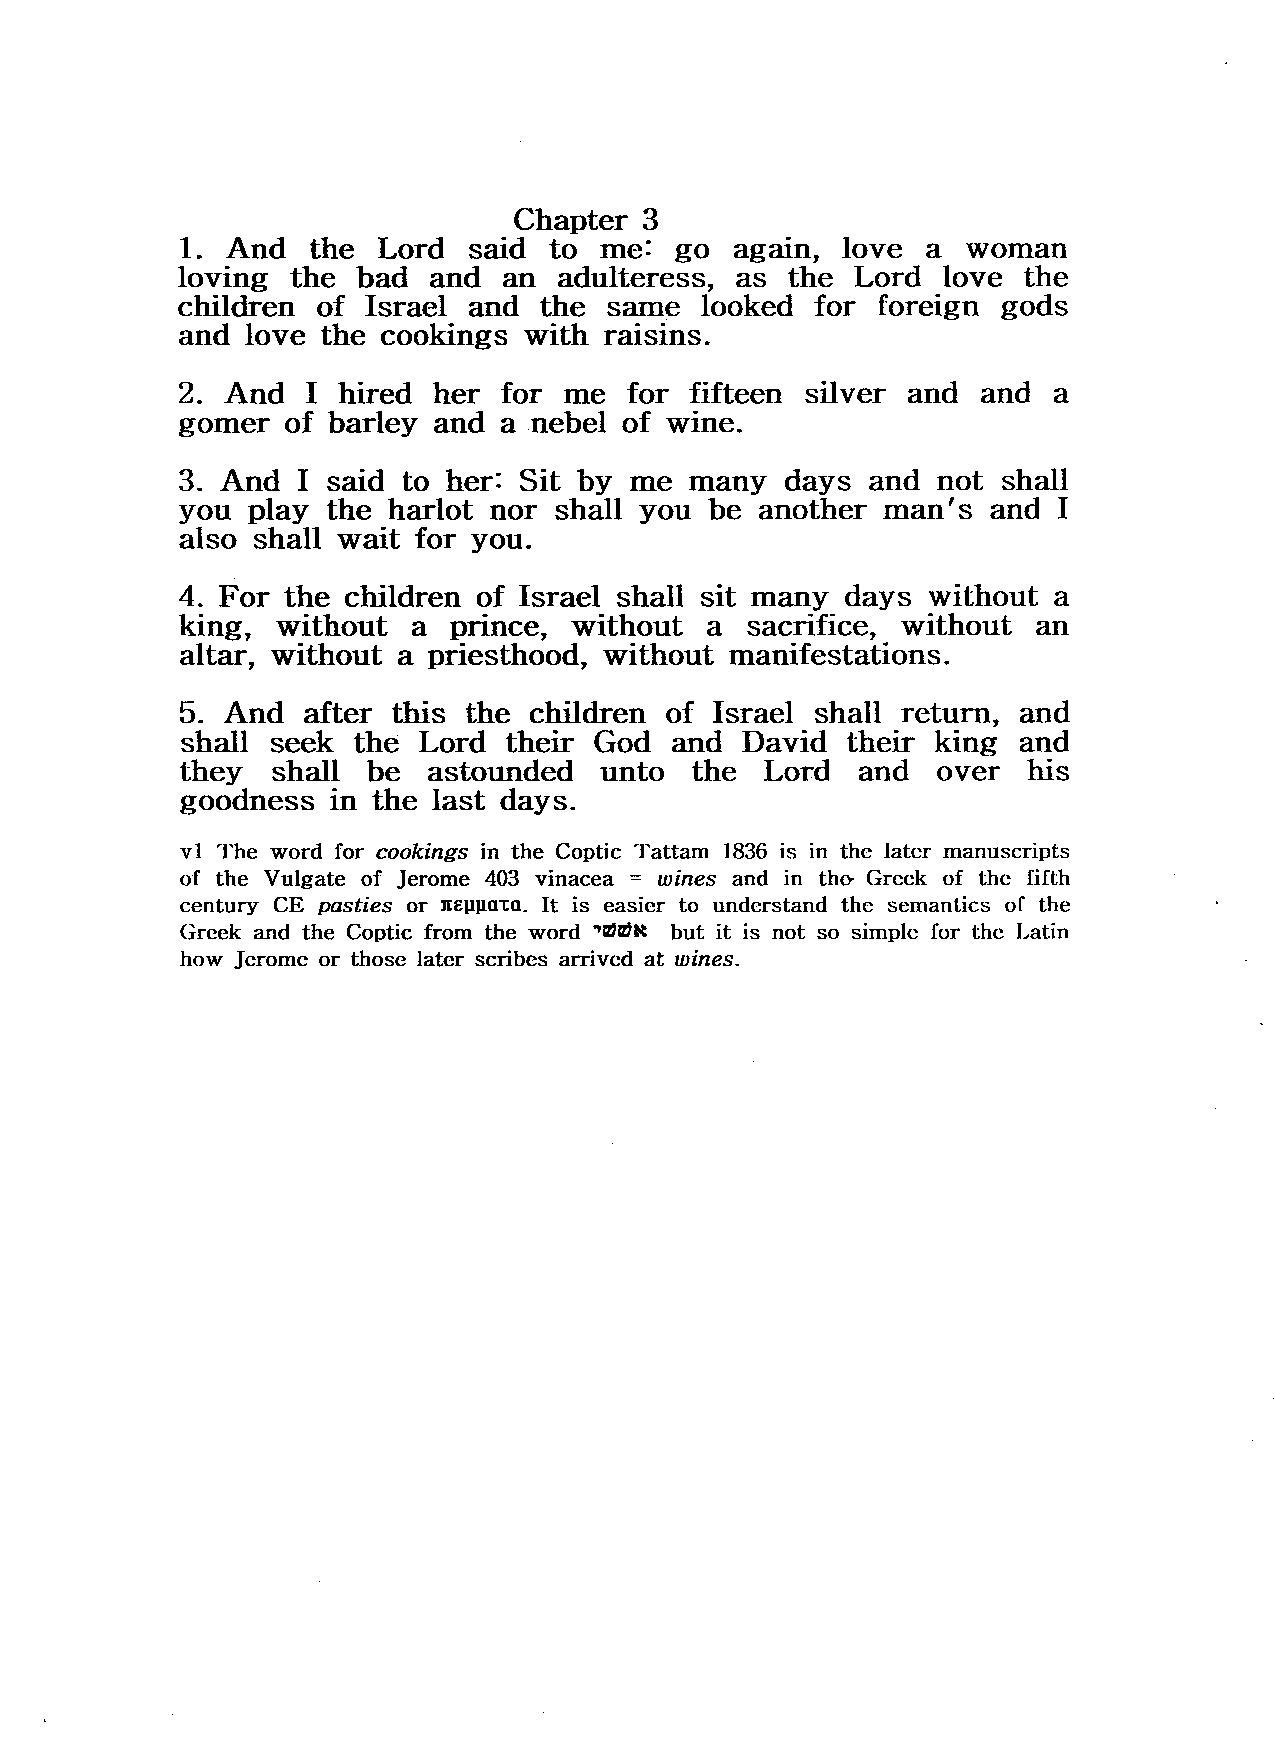 coptic of hosea in english 3.jpg